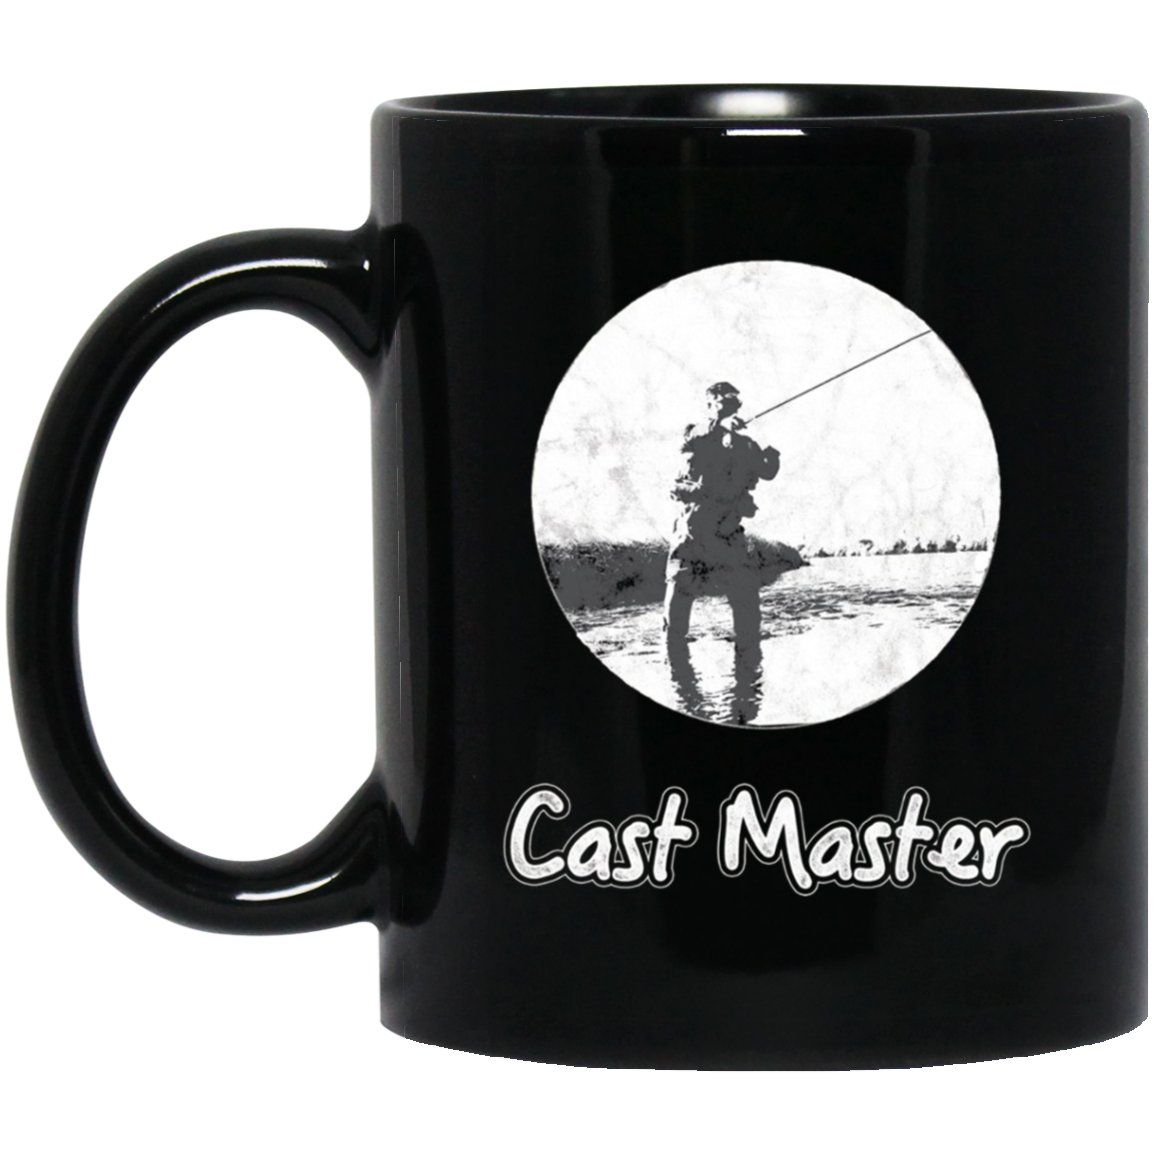 Mens Fishing - Cast Master Vintage Look Black  Mug Black Ceramic 11oz Coffee Tea Cup